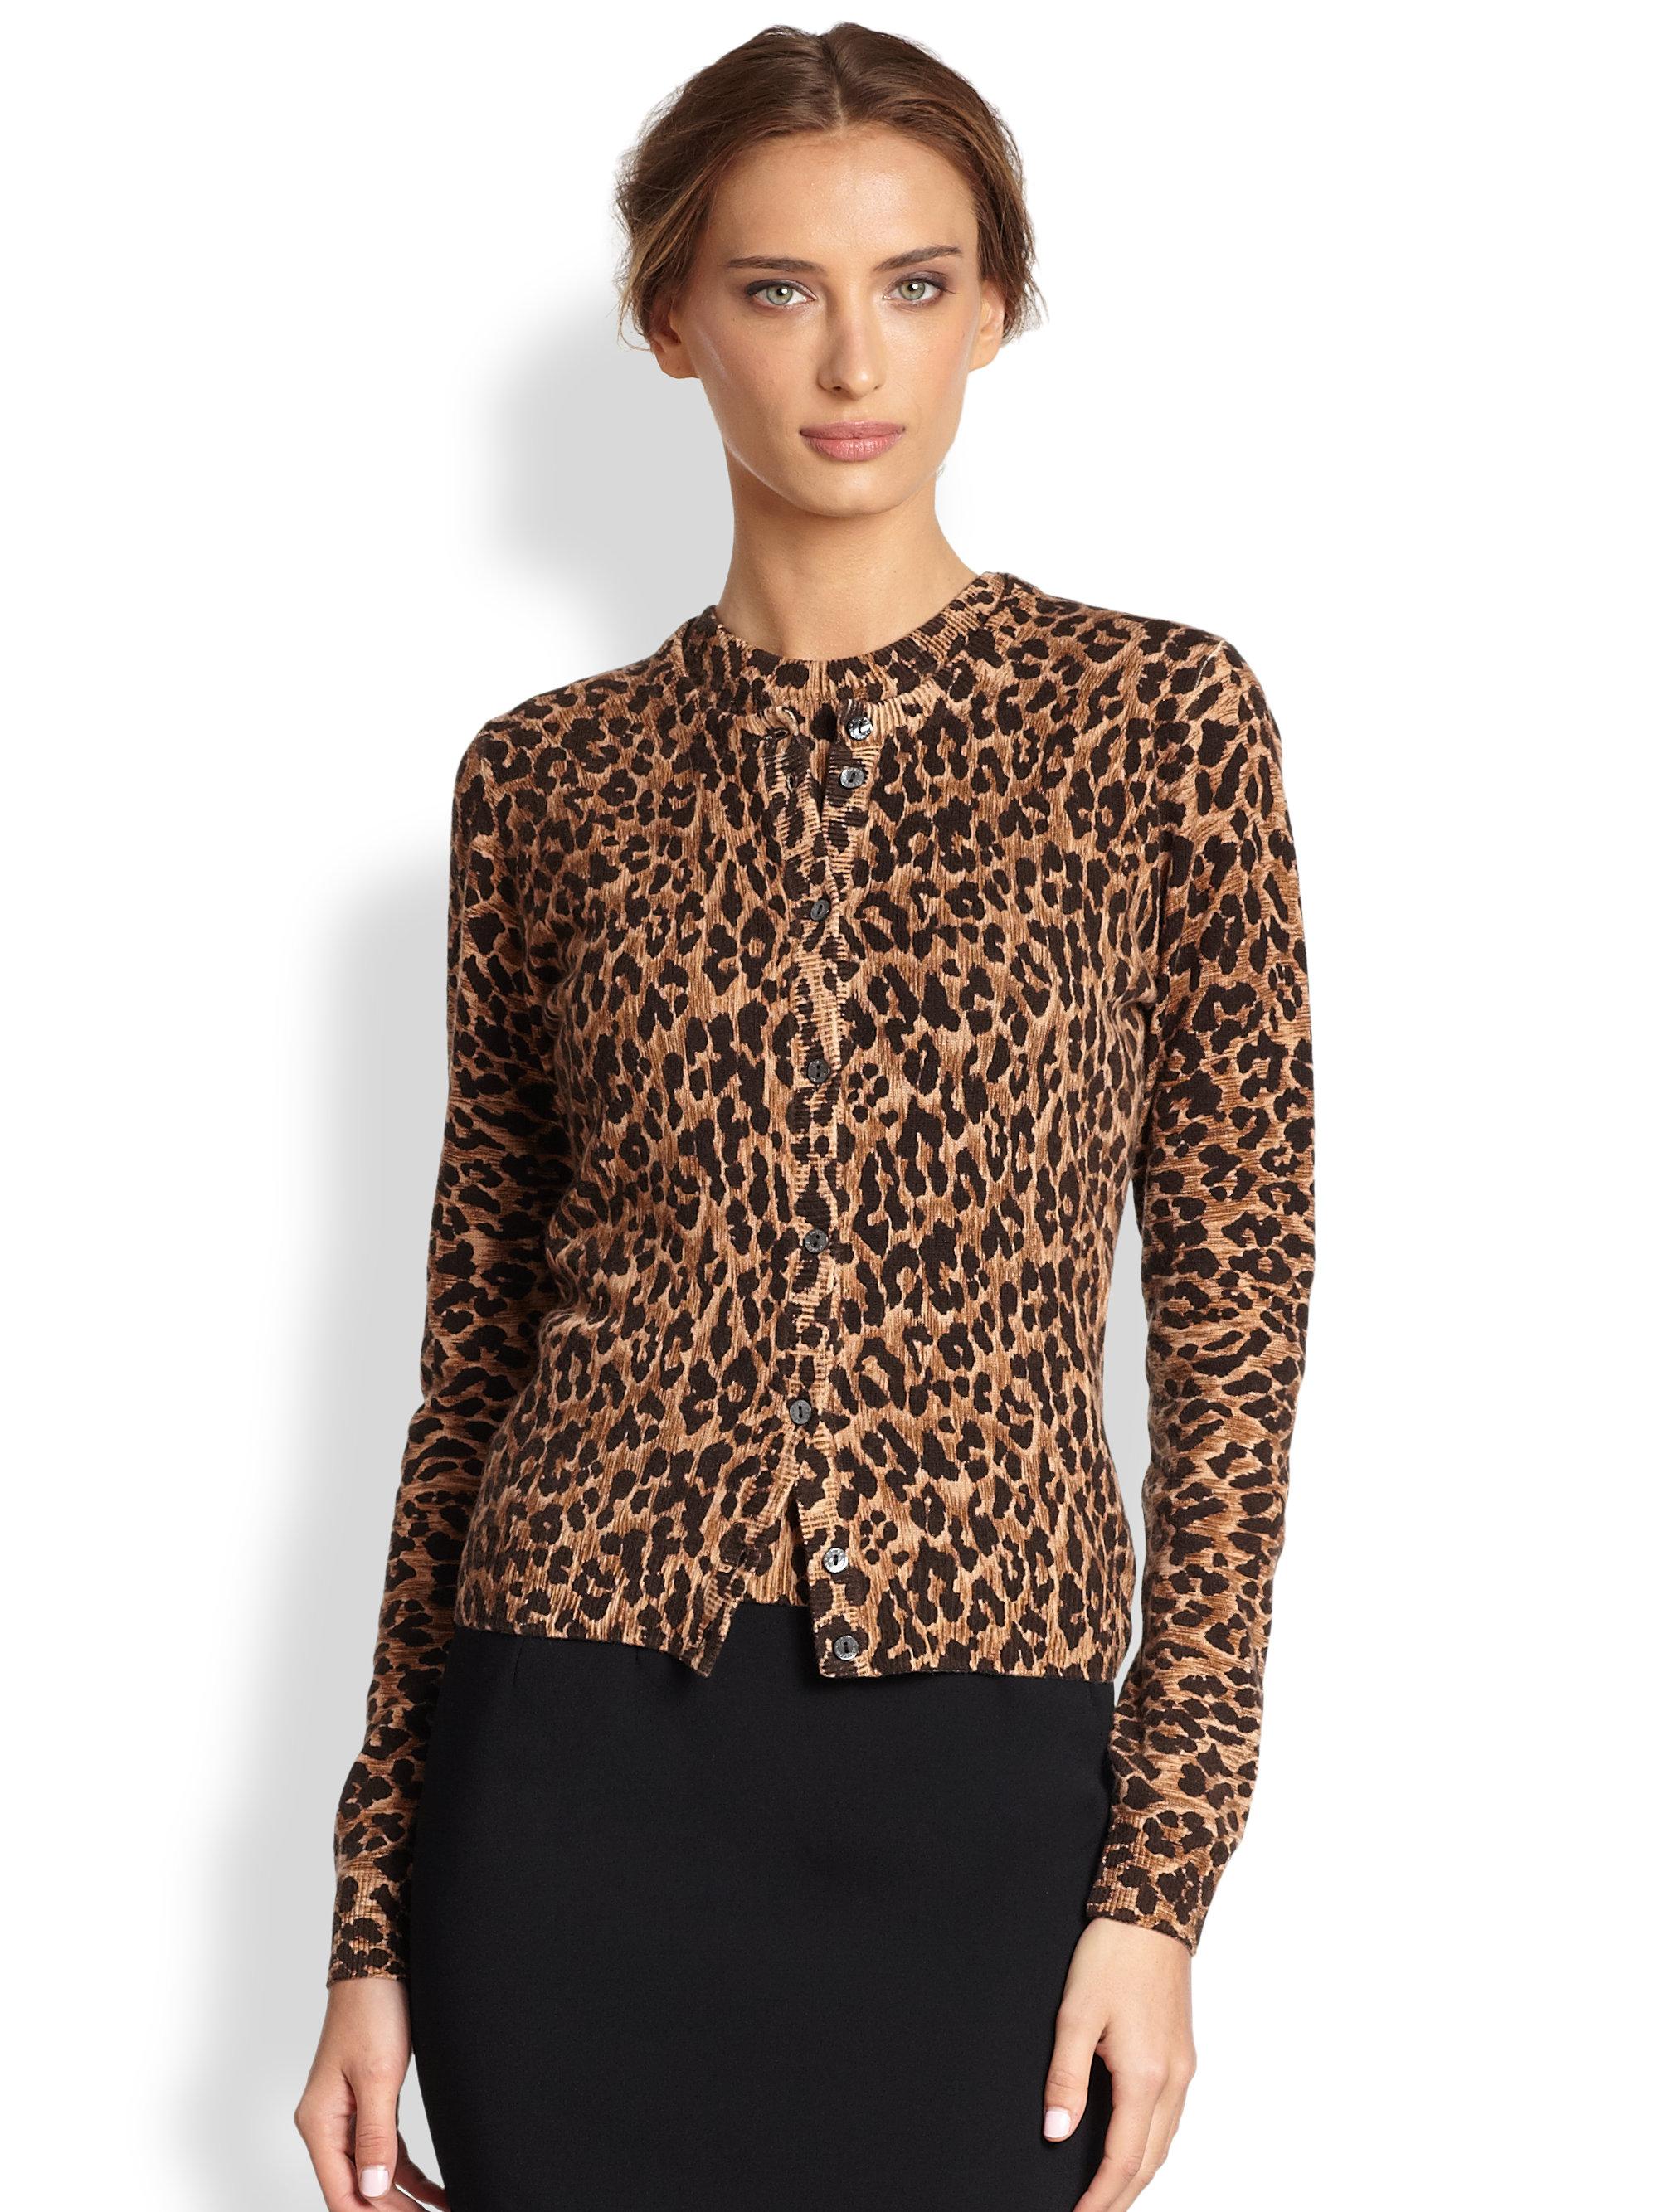 Dolce & gabbana Cashmere Leopard Print Cardigan | Lyst